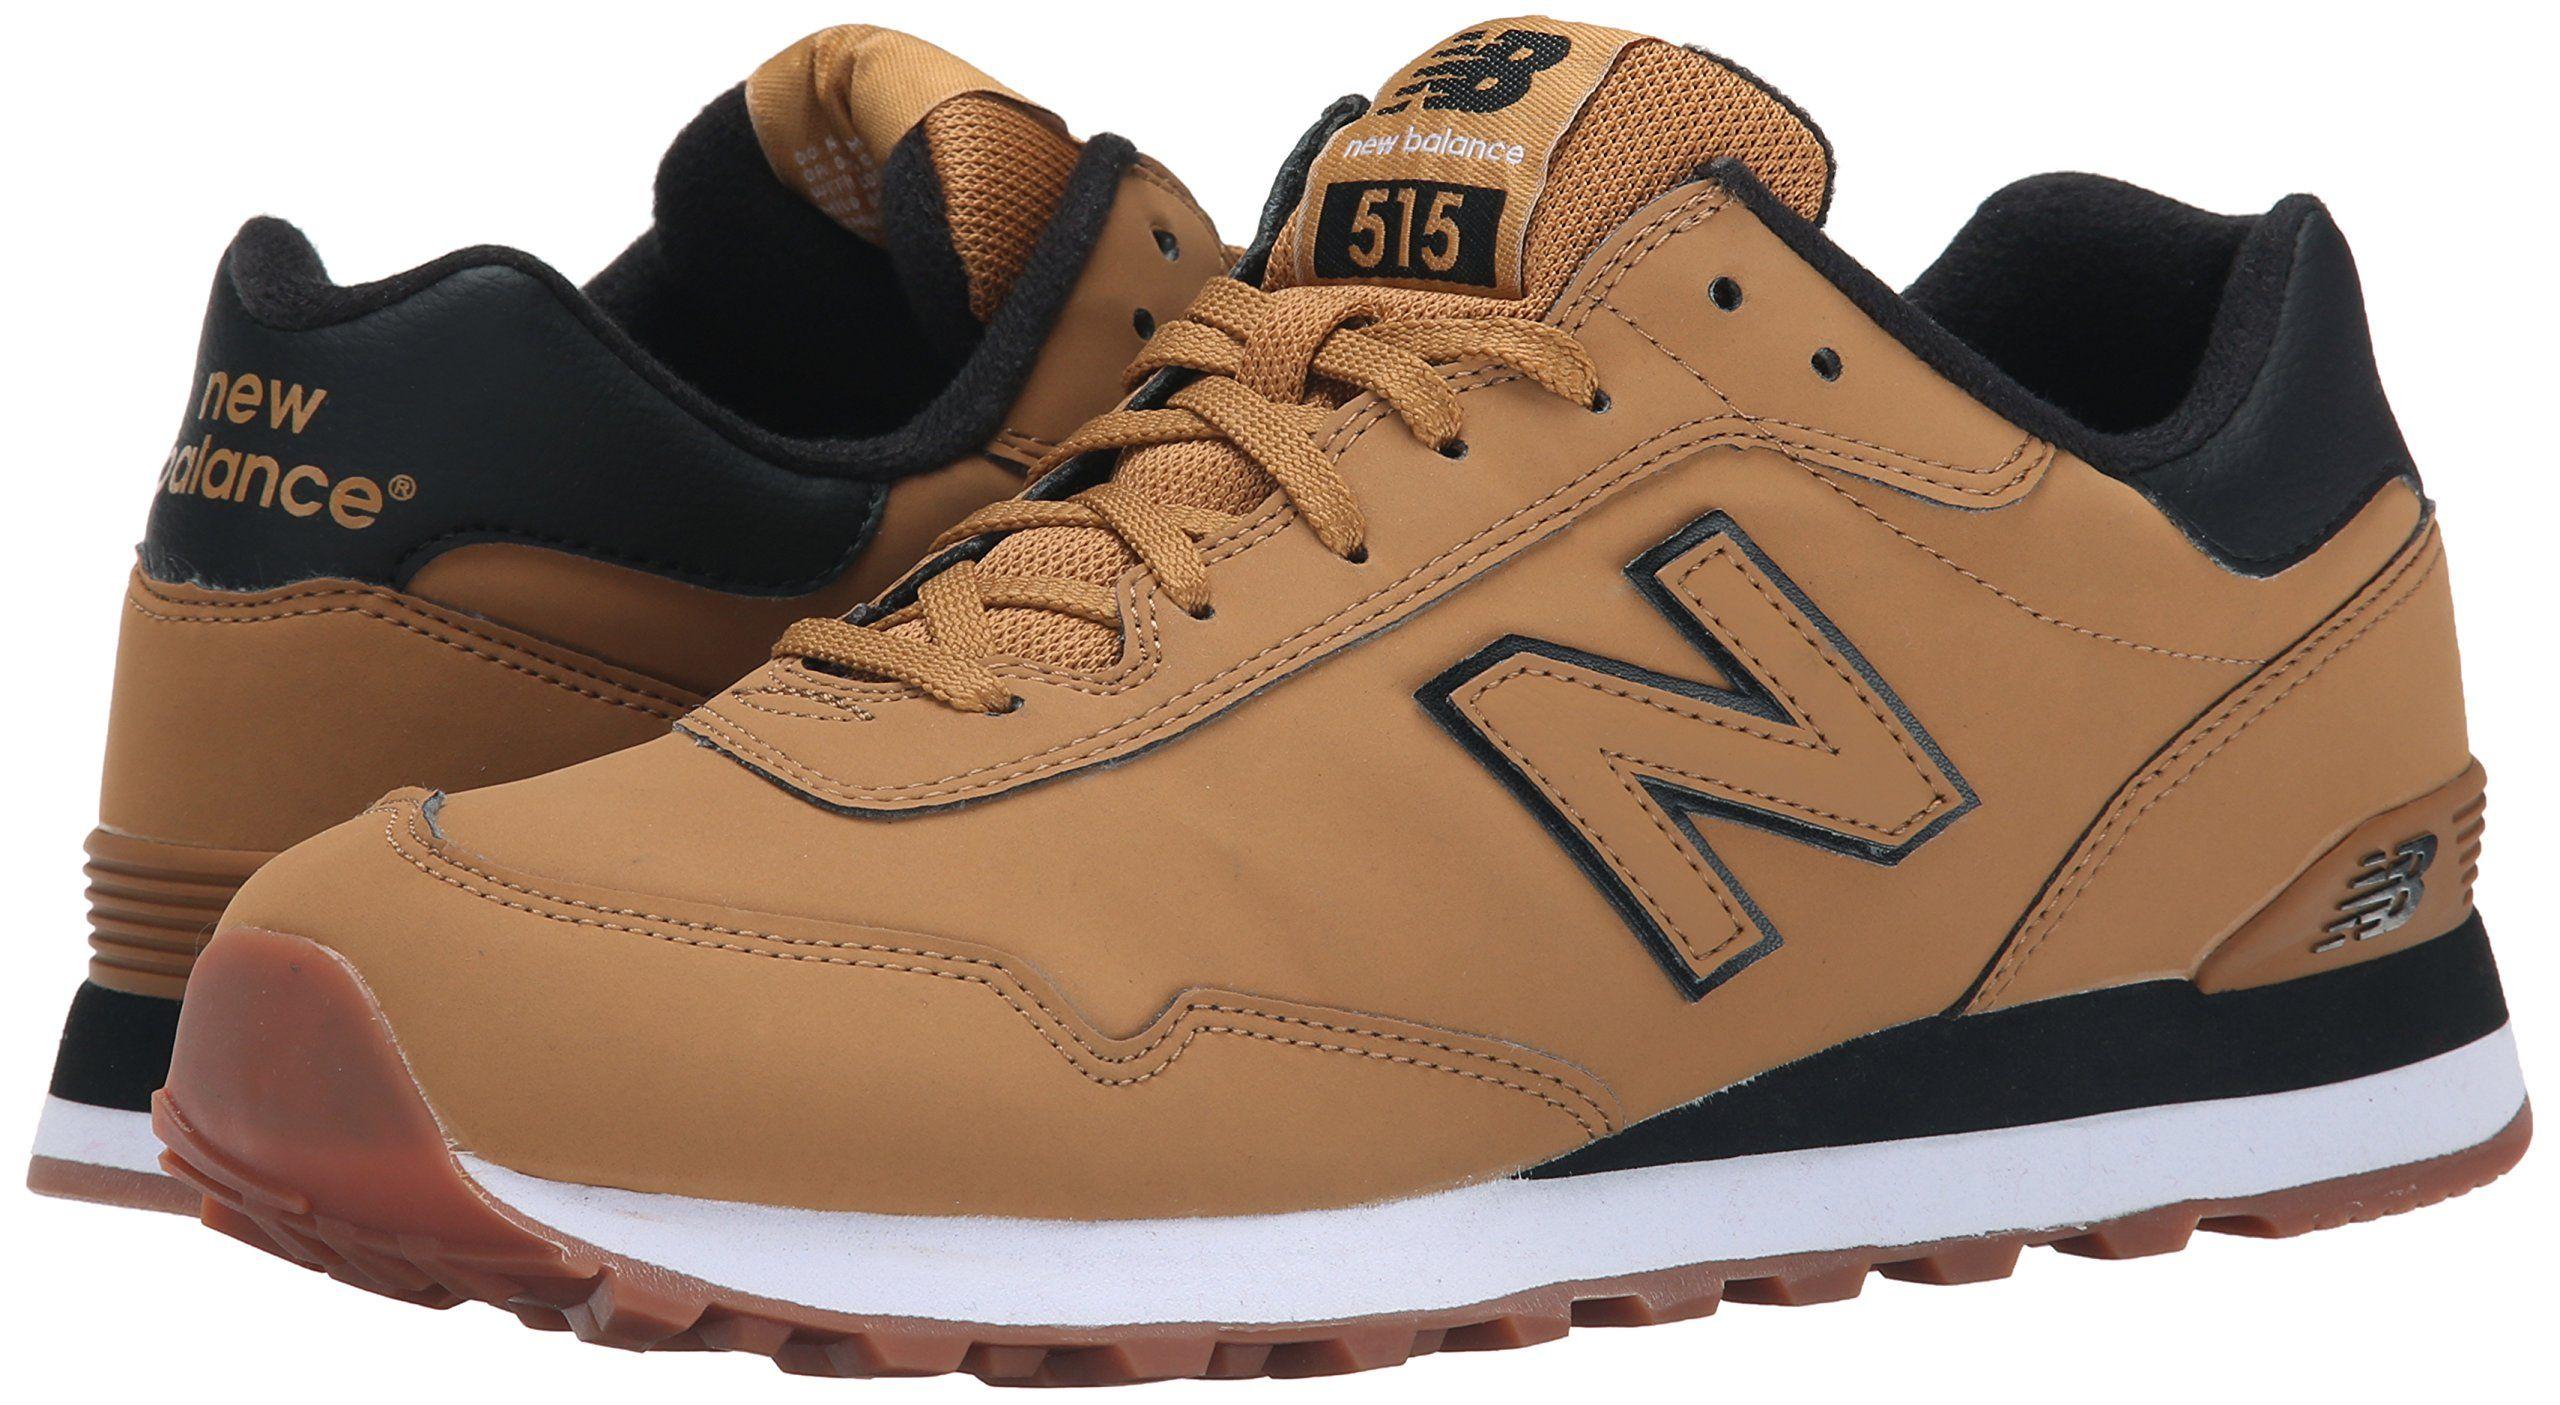 Amazon.com: New Balance Men's ML515 Winter Stealth Pack Classic Running  Shoe: Clothing